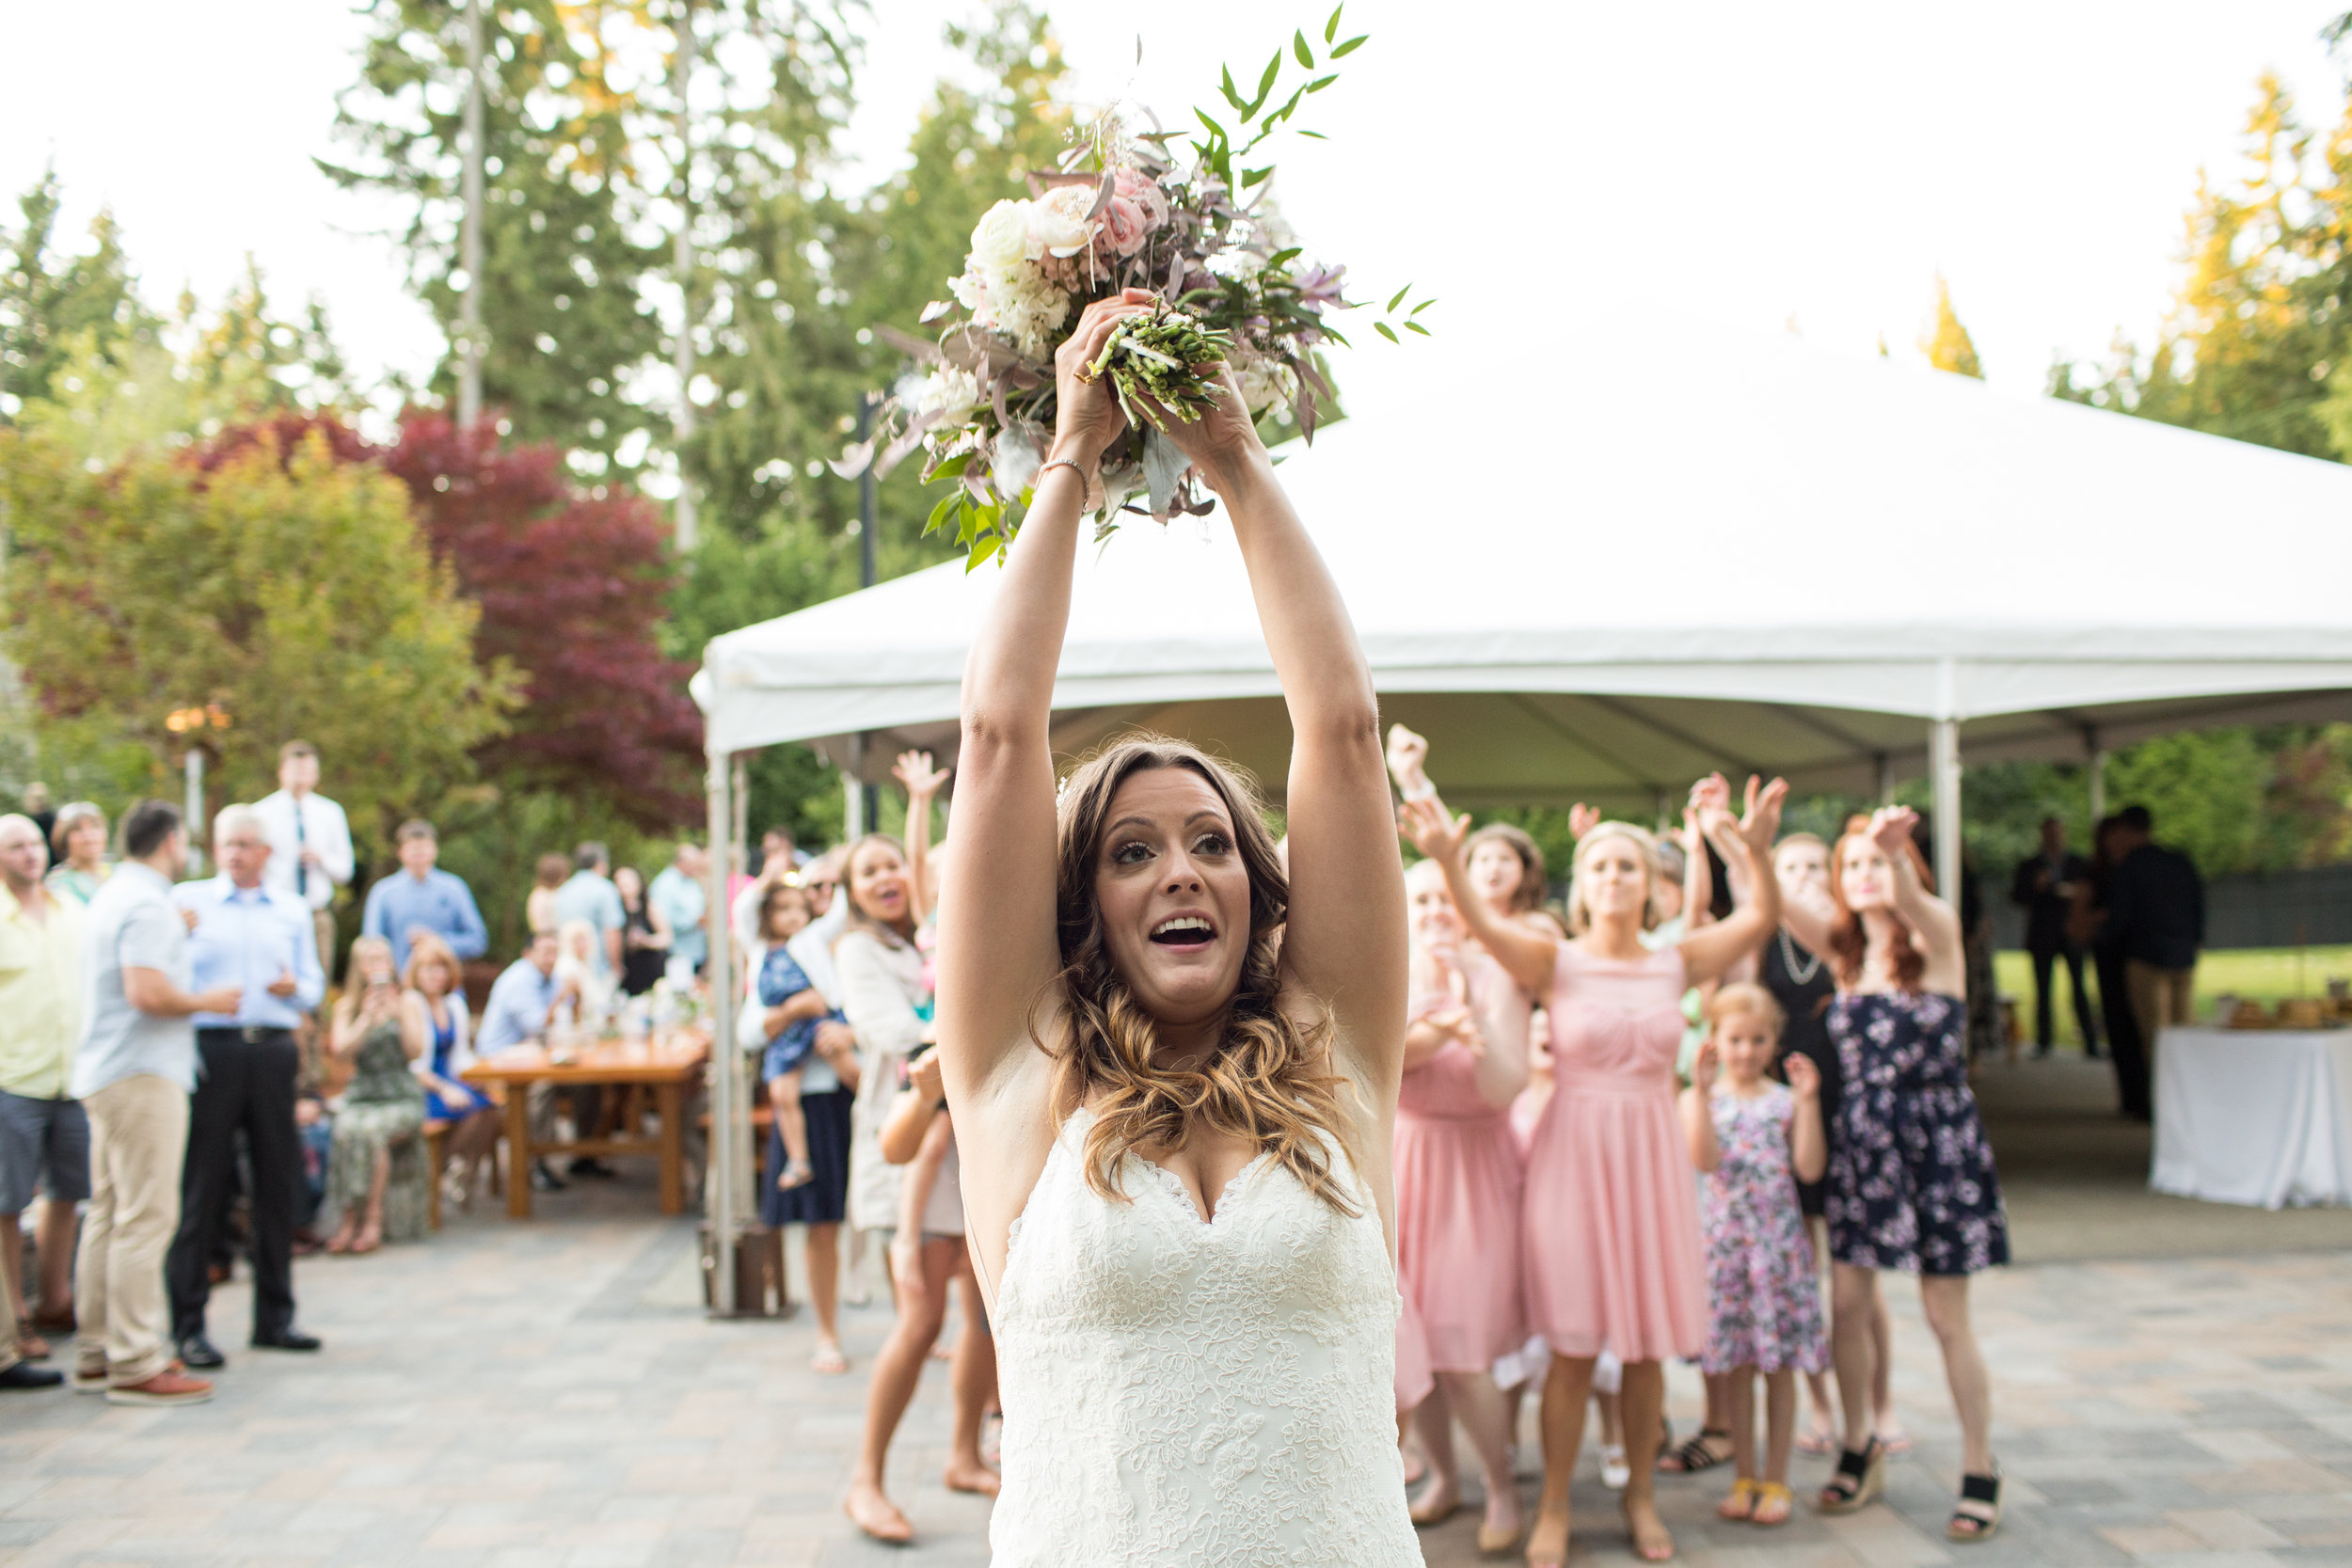 sandstrom_wedding_771.jpg